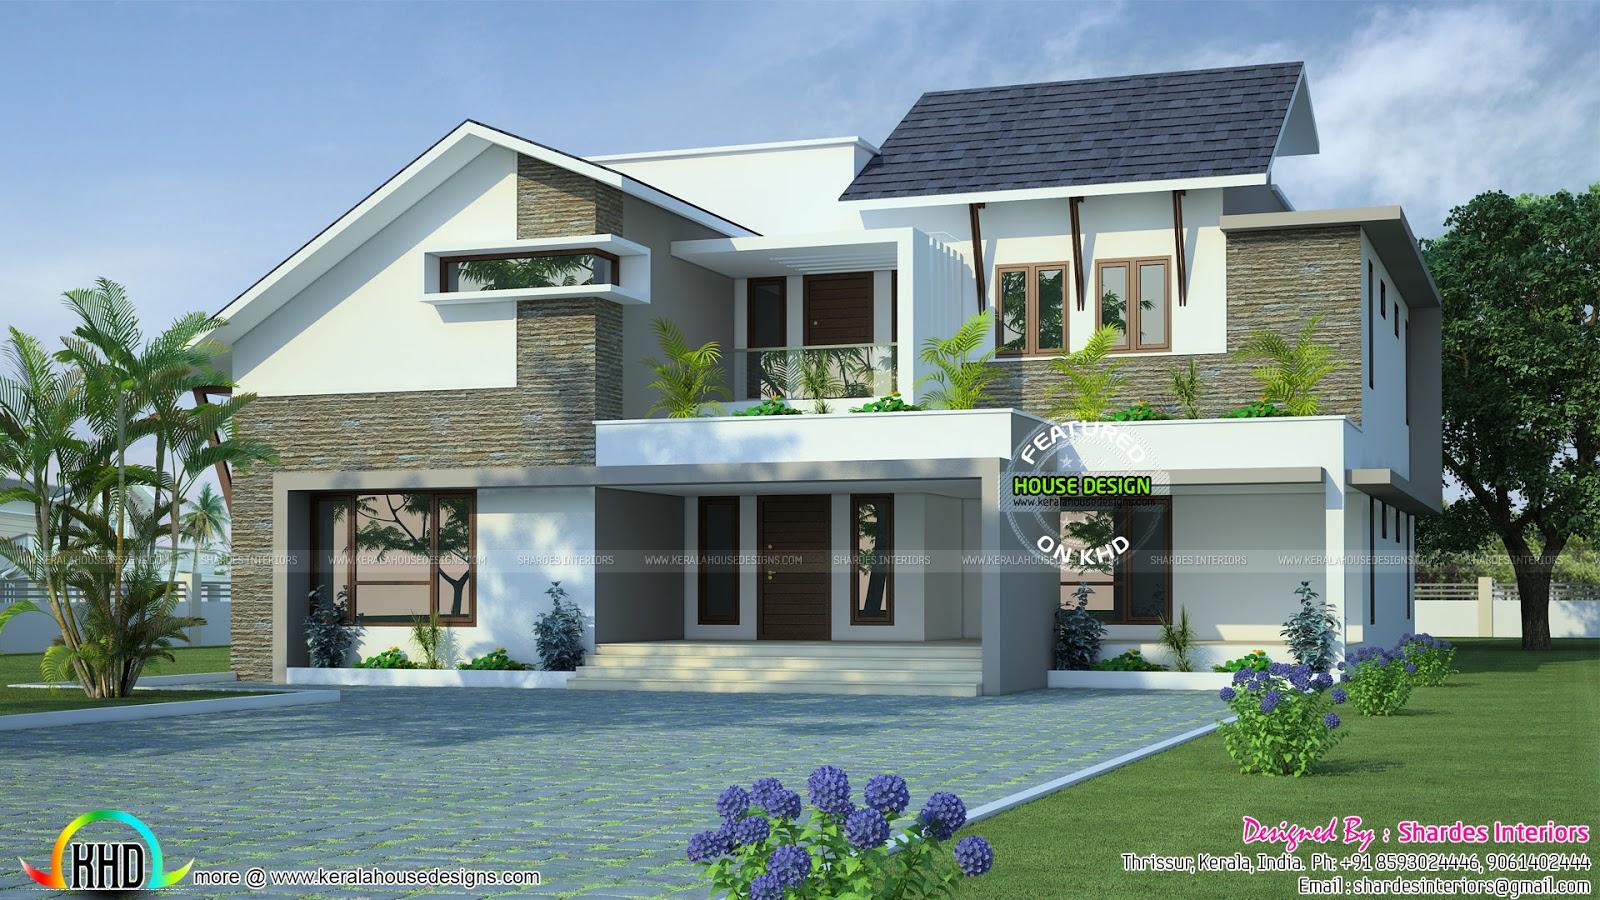 Grand modern residence kerala home design and floor plans for Grand designs modern house